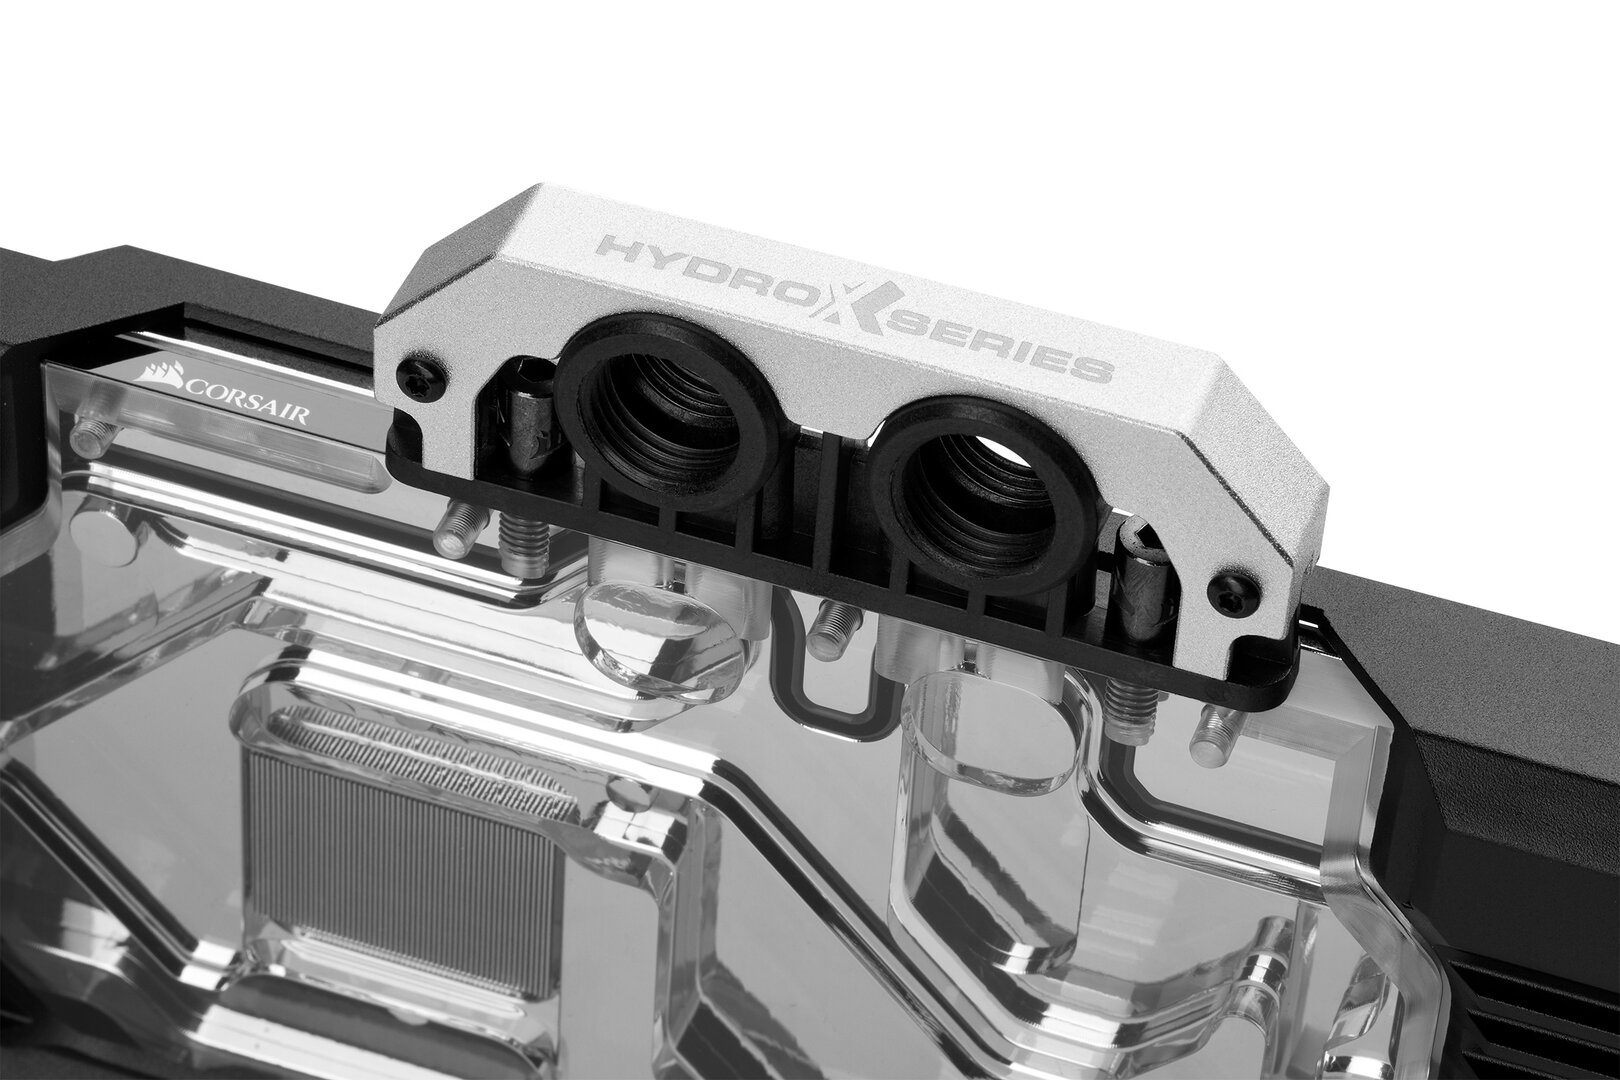 Corsair Hydro X XG7: Fullcover-Wasserkühler für die Nvidia RTX 2080 Ti